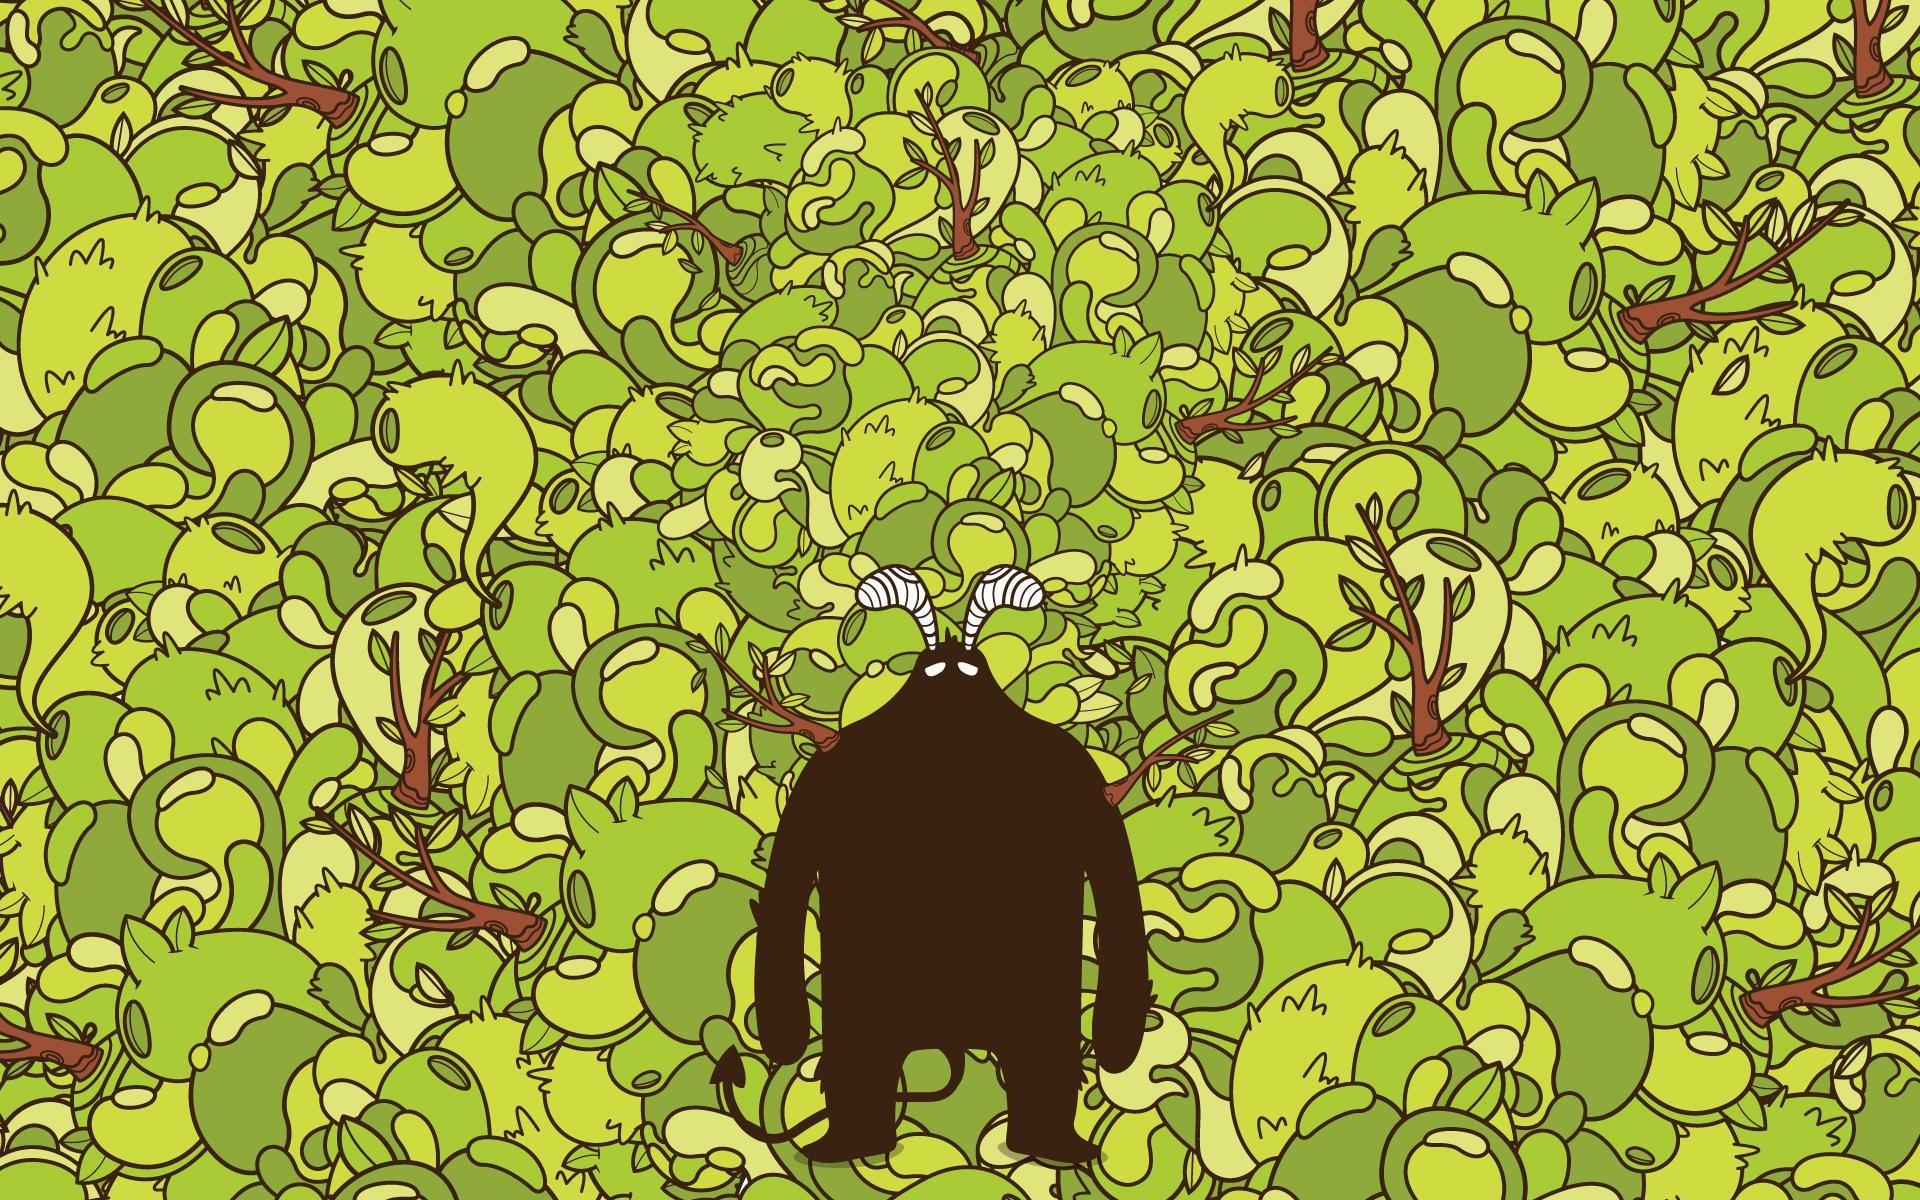 Realtree-Camo-Cartoon-Wallpaper